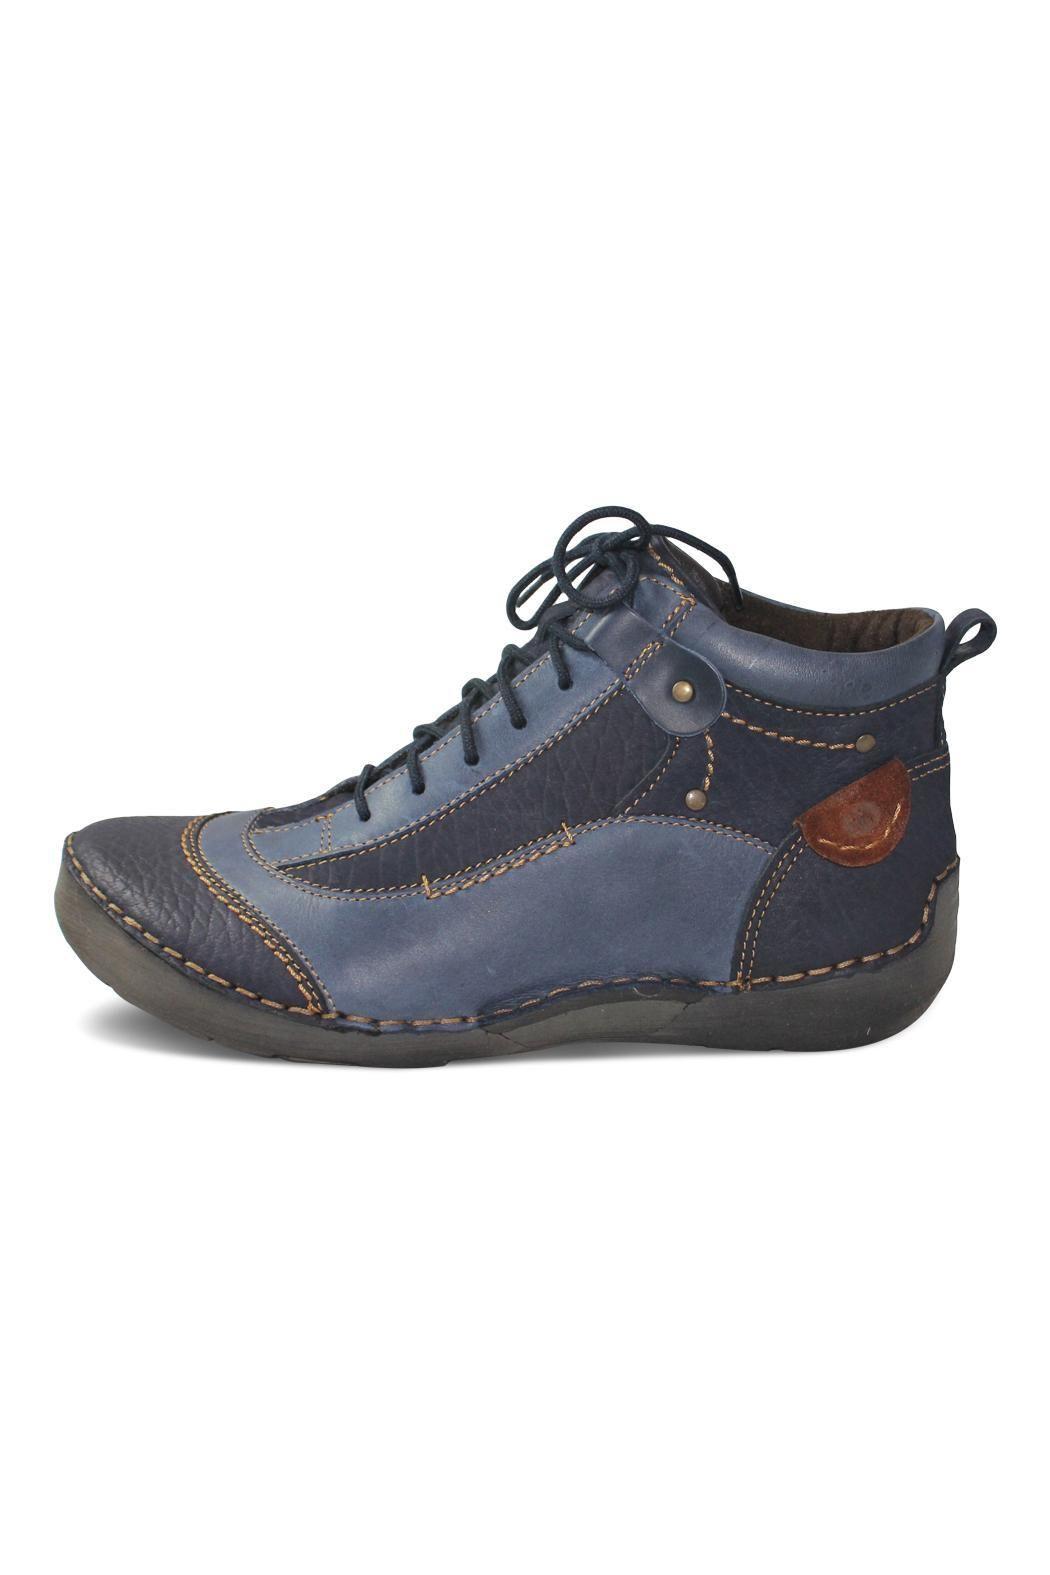 Blue Ankle Boot Blue Ankle Boots Boots Shoe Boots